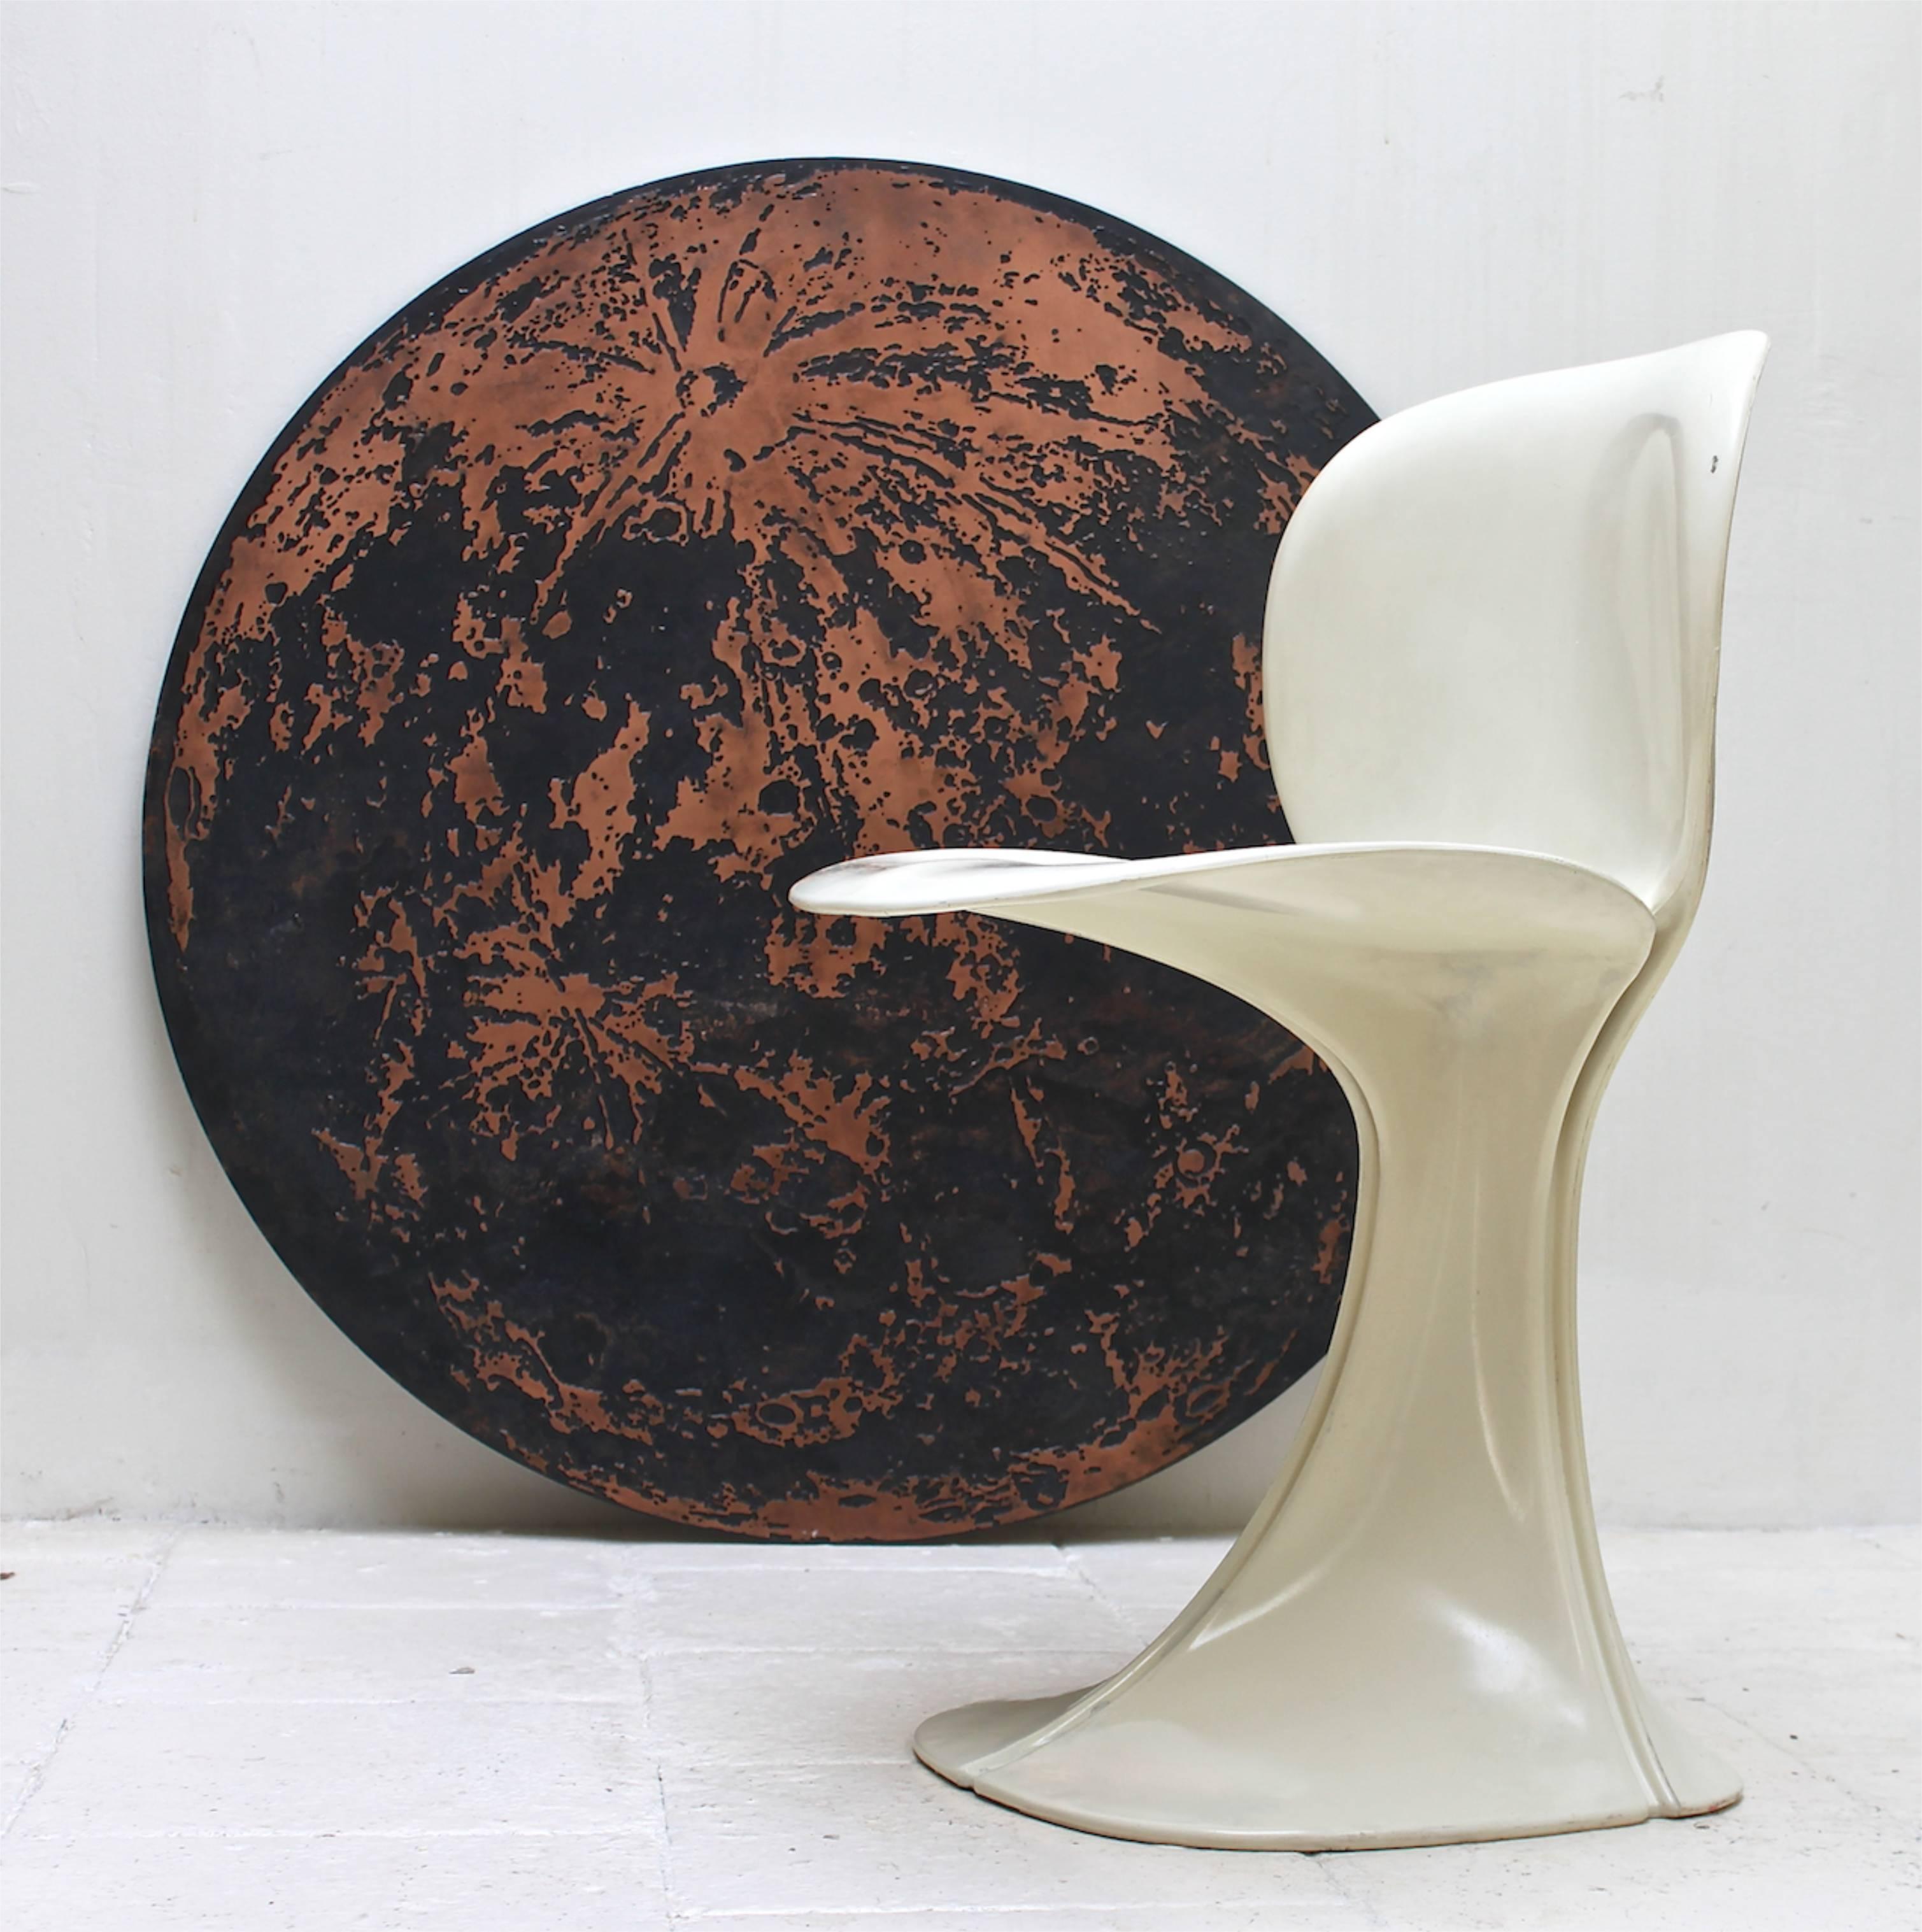 pierre-paulinrare-flower-chair-pierre-paulin-for-boro-belgium-1973